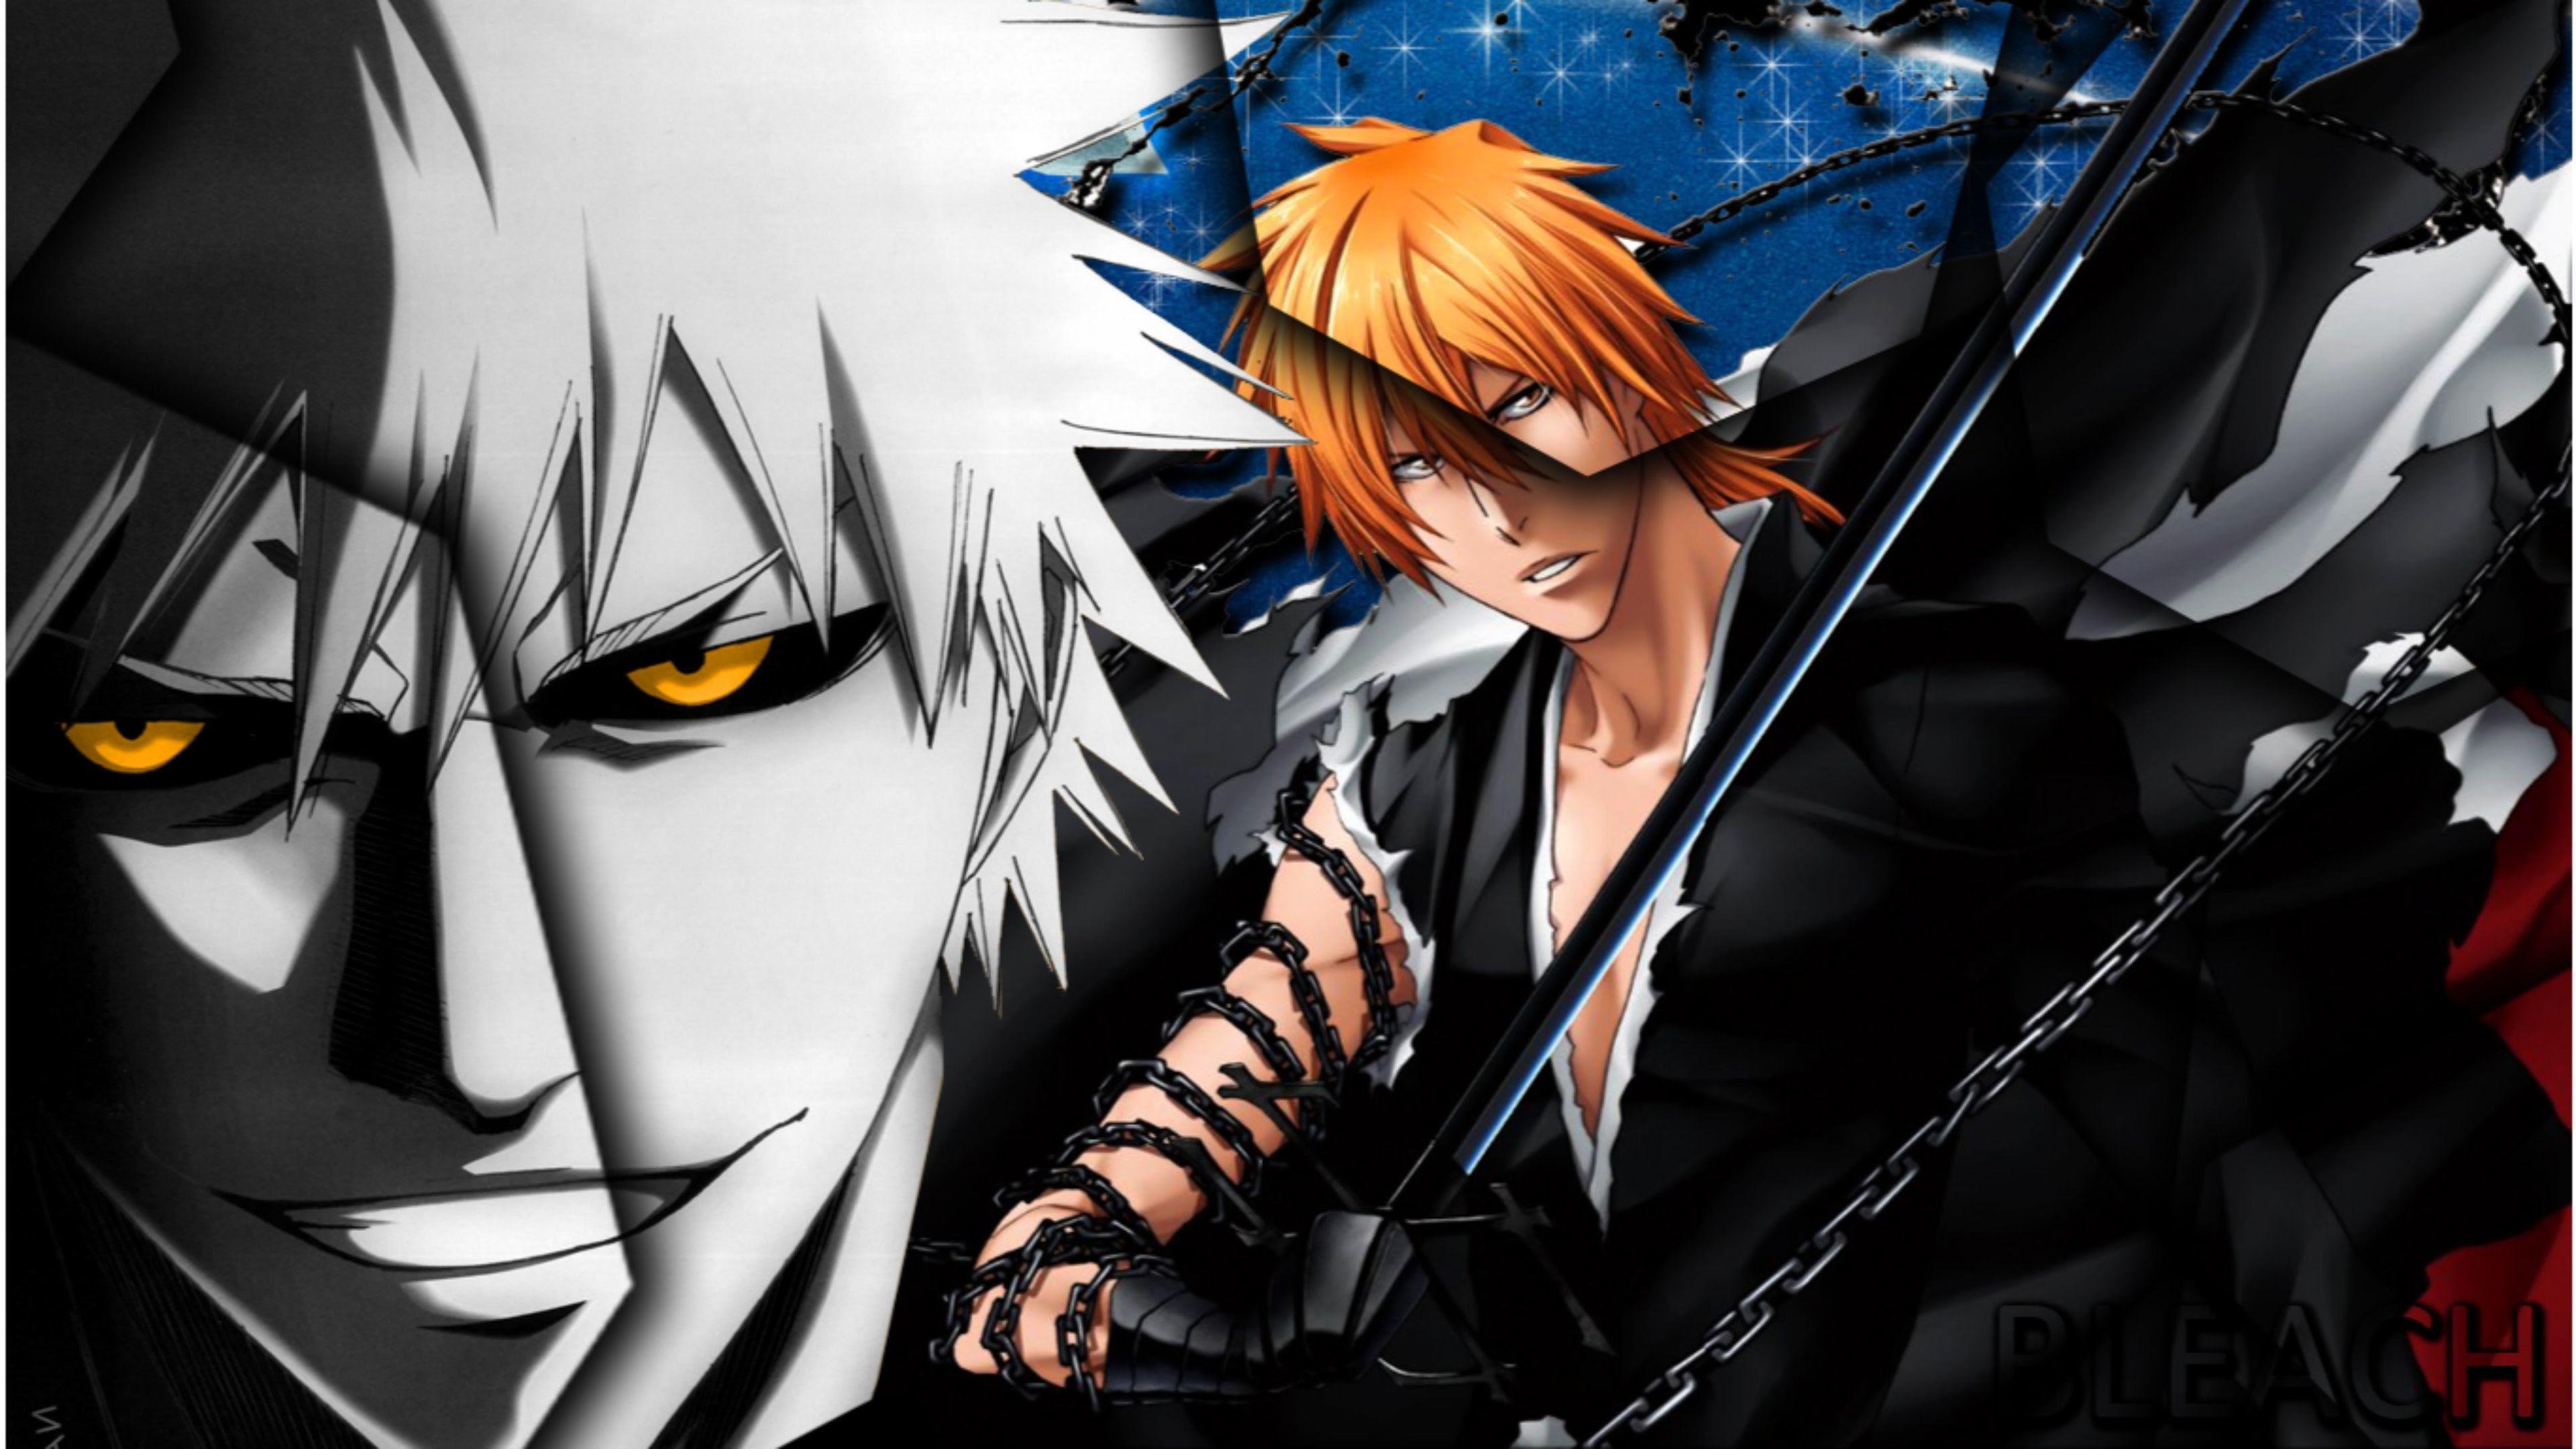 Bleach Anime Wallpaper 71+ images